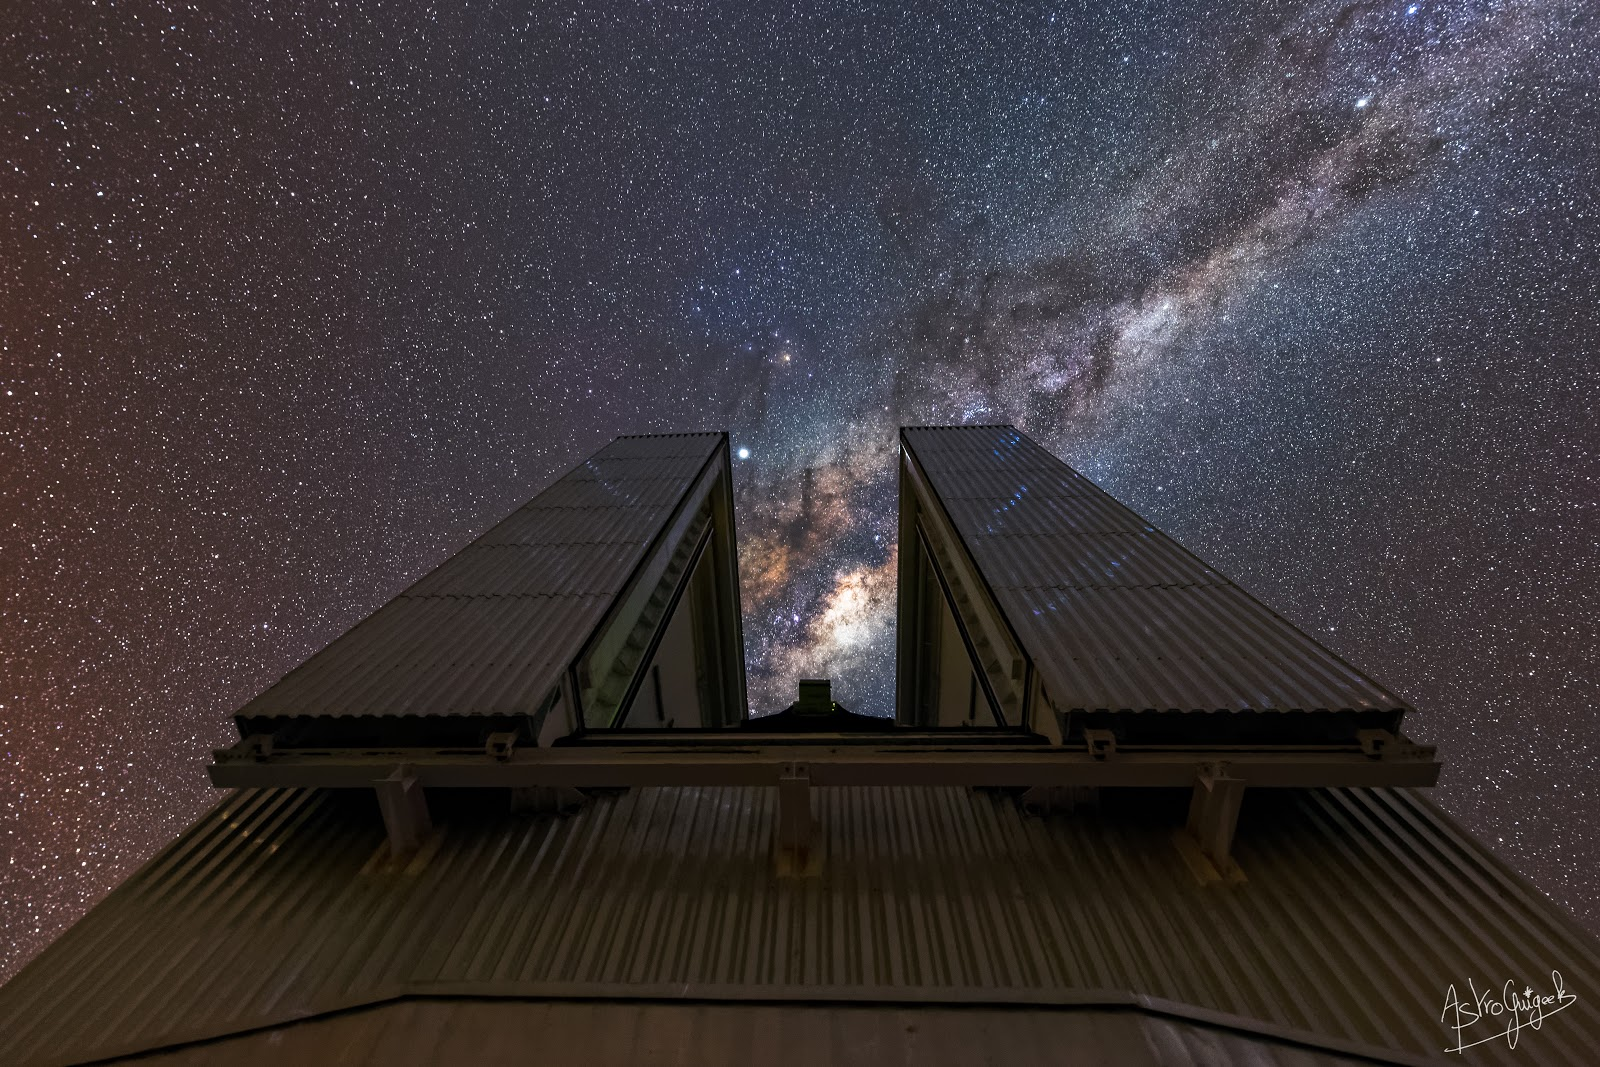 NTT telescope & the Milky Way